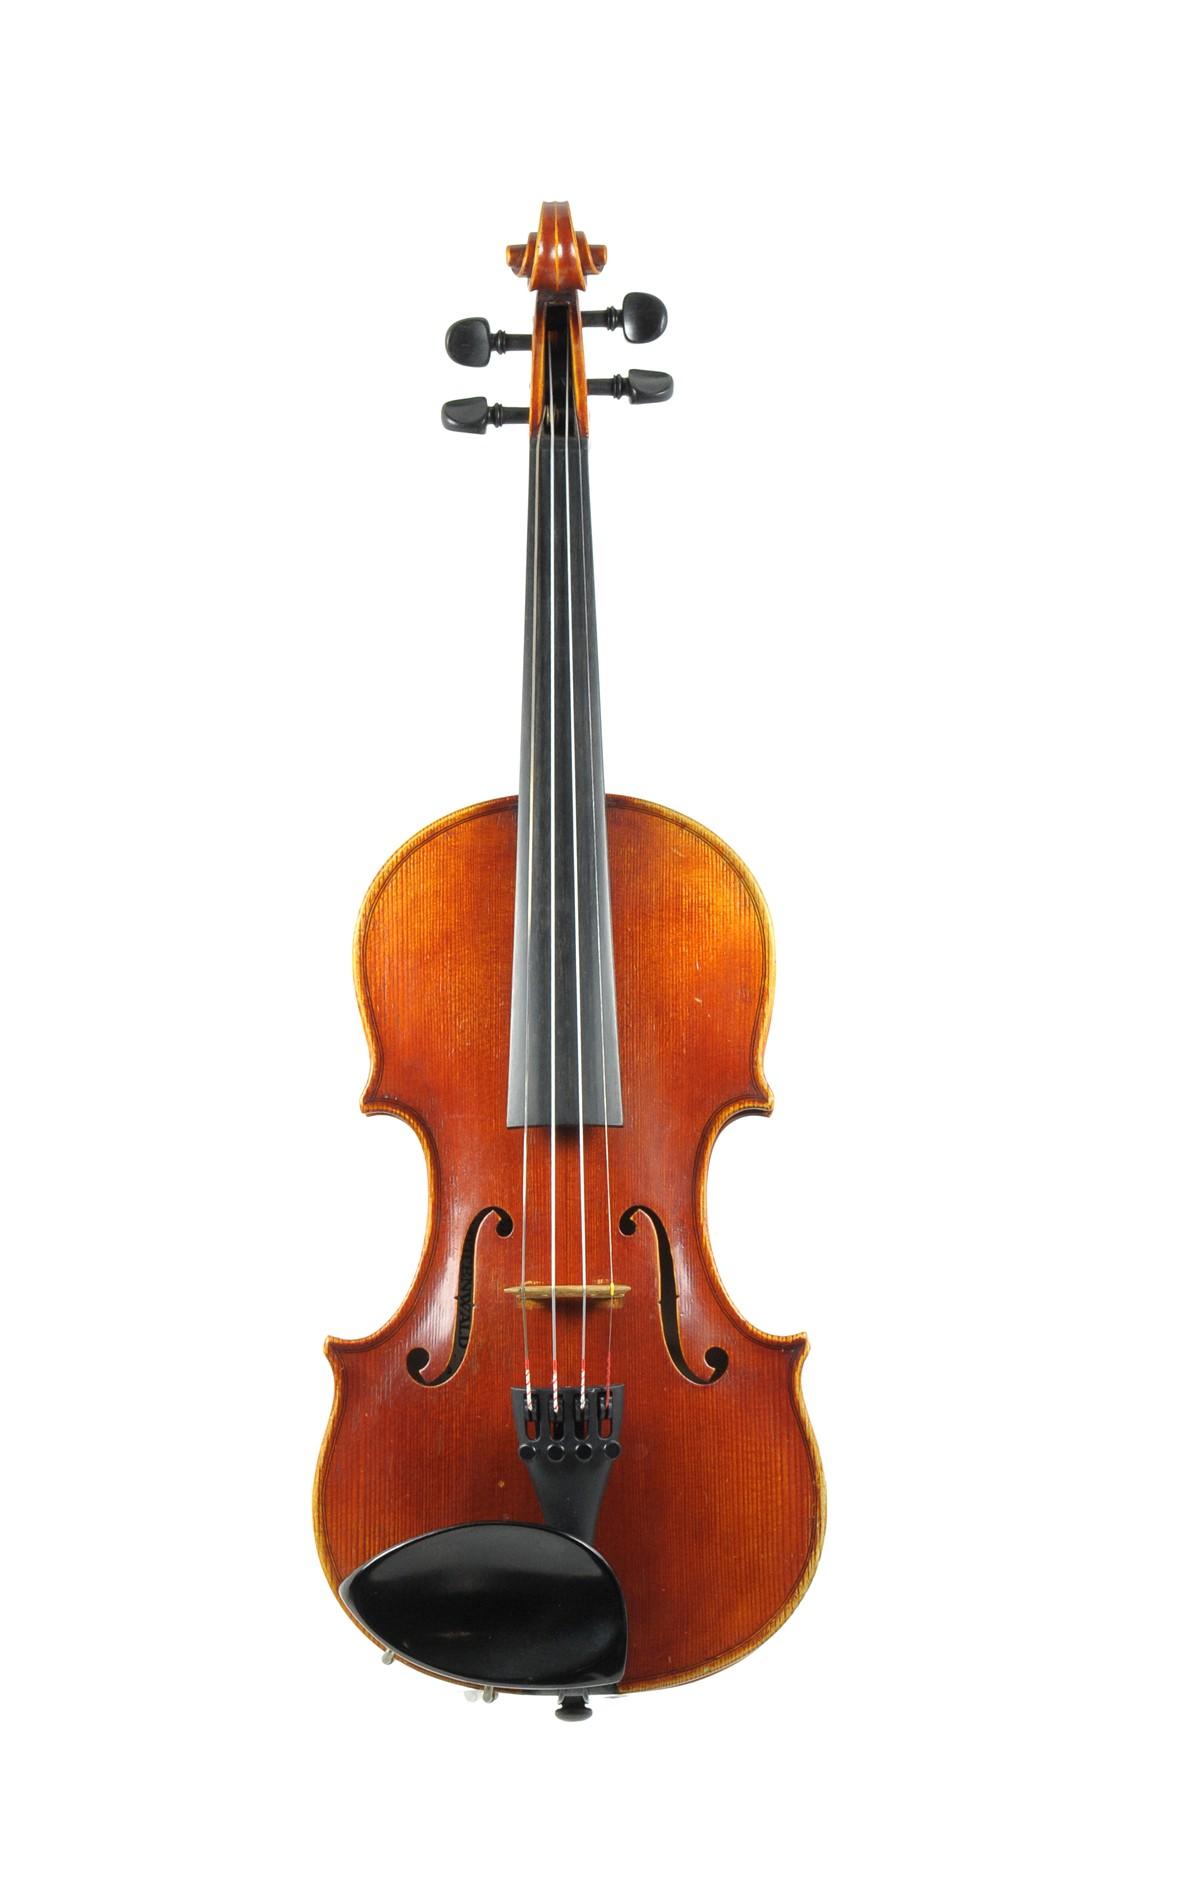 Sebastian Hornsteiner, 1/2 violin, Mittenwald violin making school - top